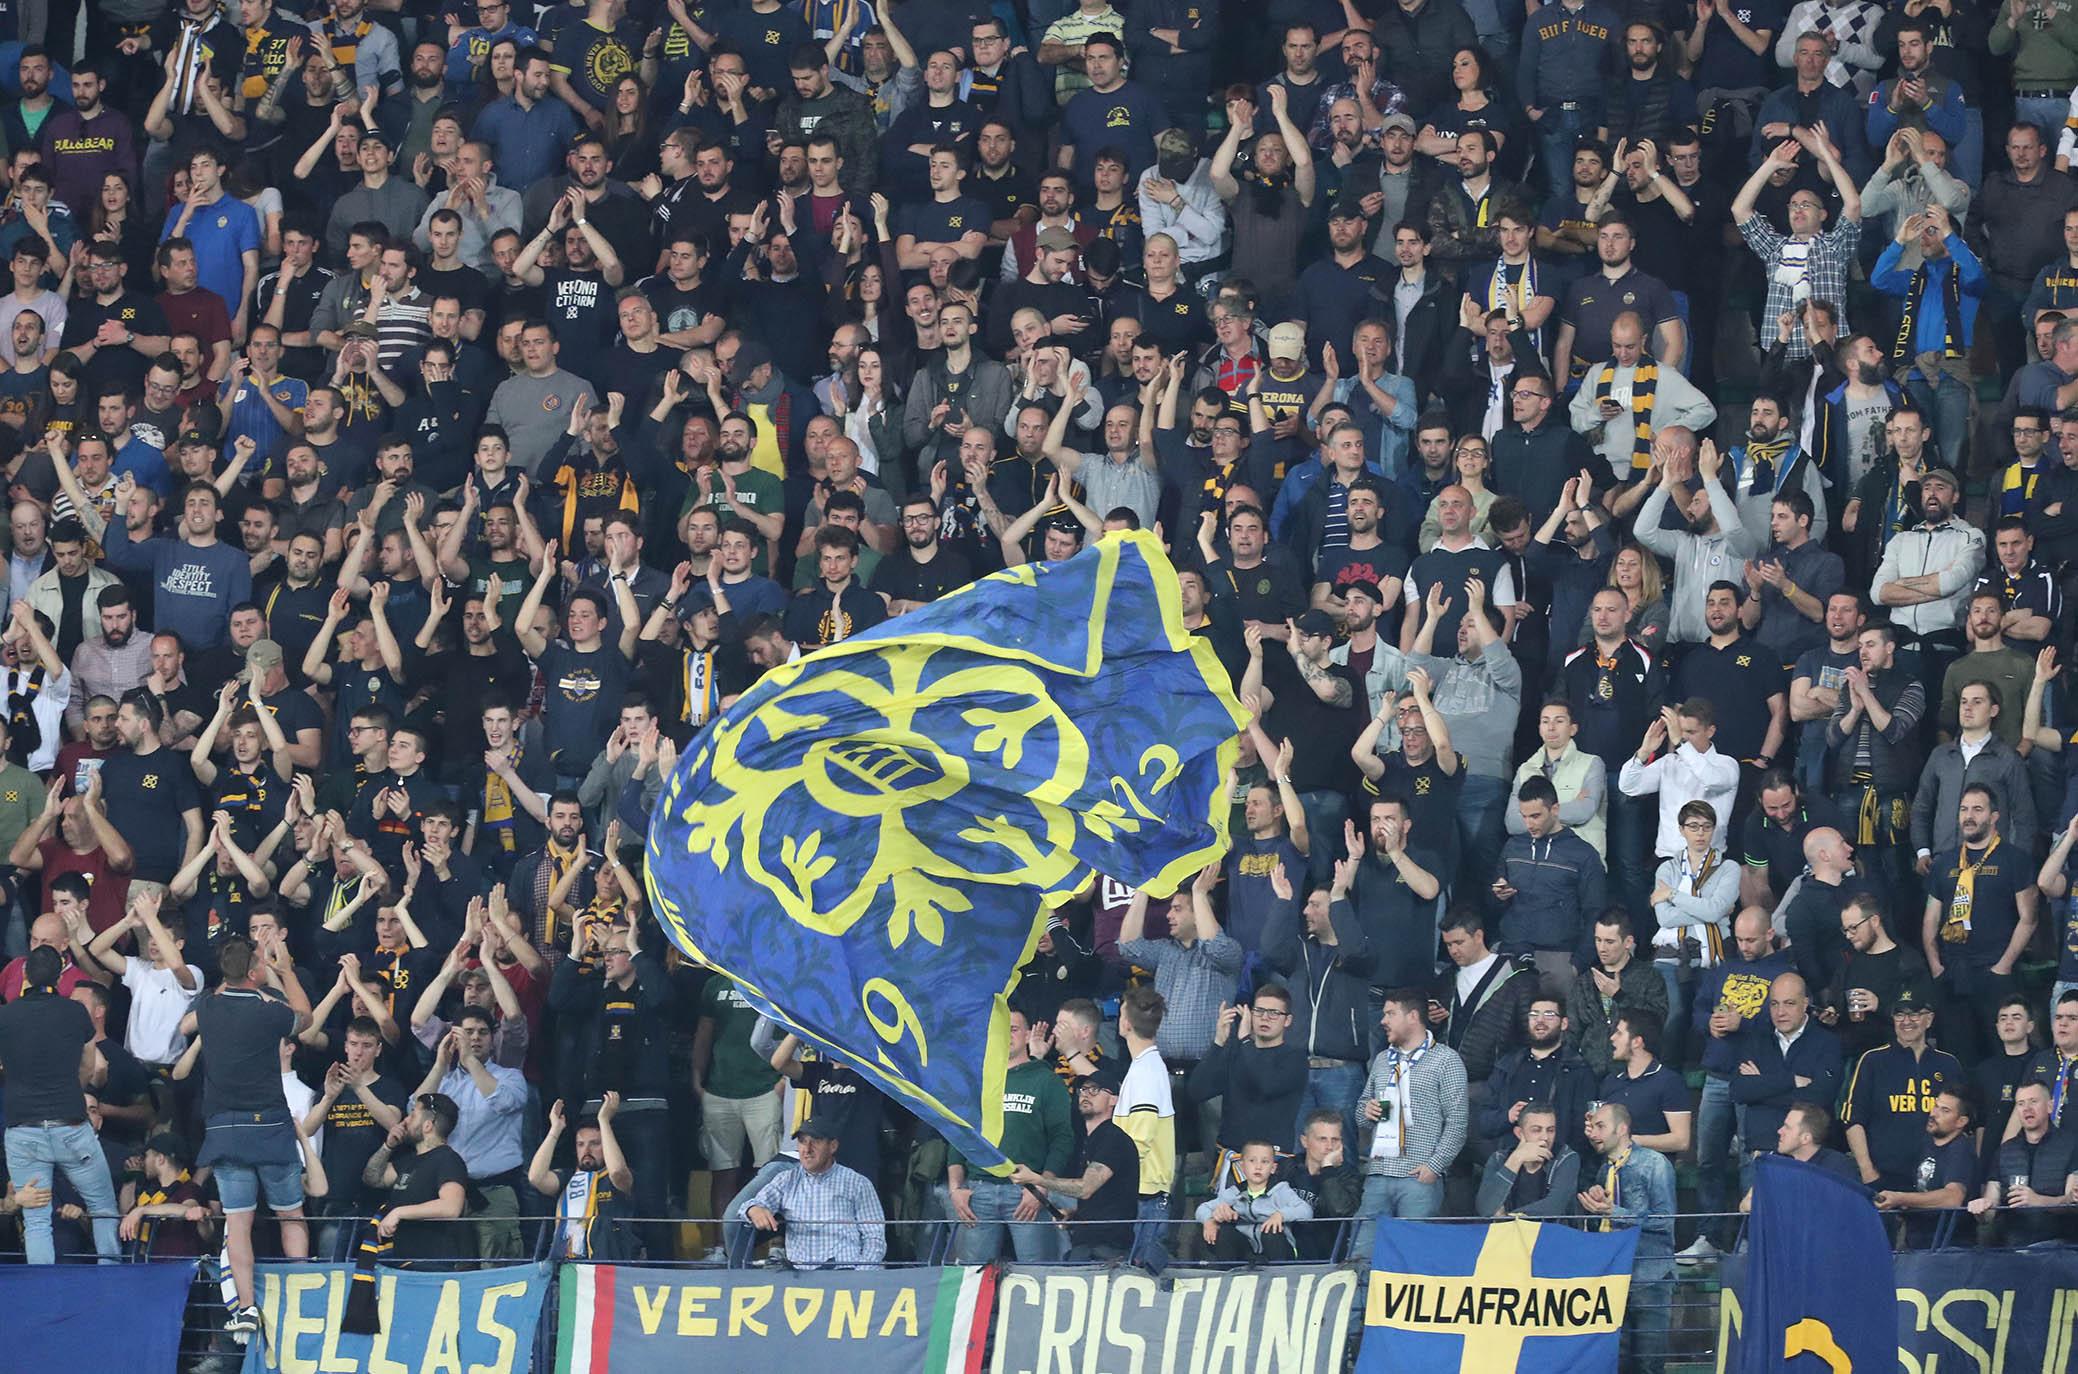 Calendario Arena Verona 2020.Presentata La Campagna Abbonamenti 2019 2020 Calcio Hellas